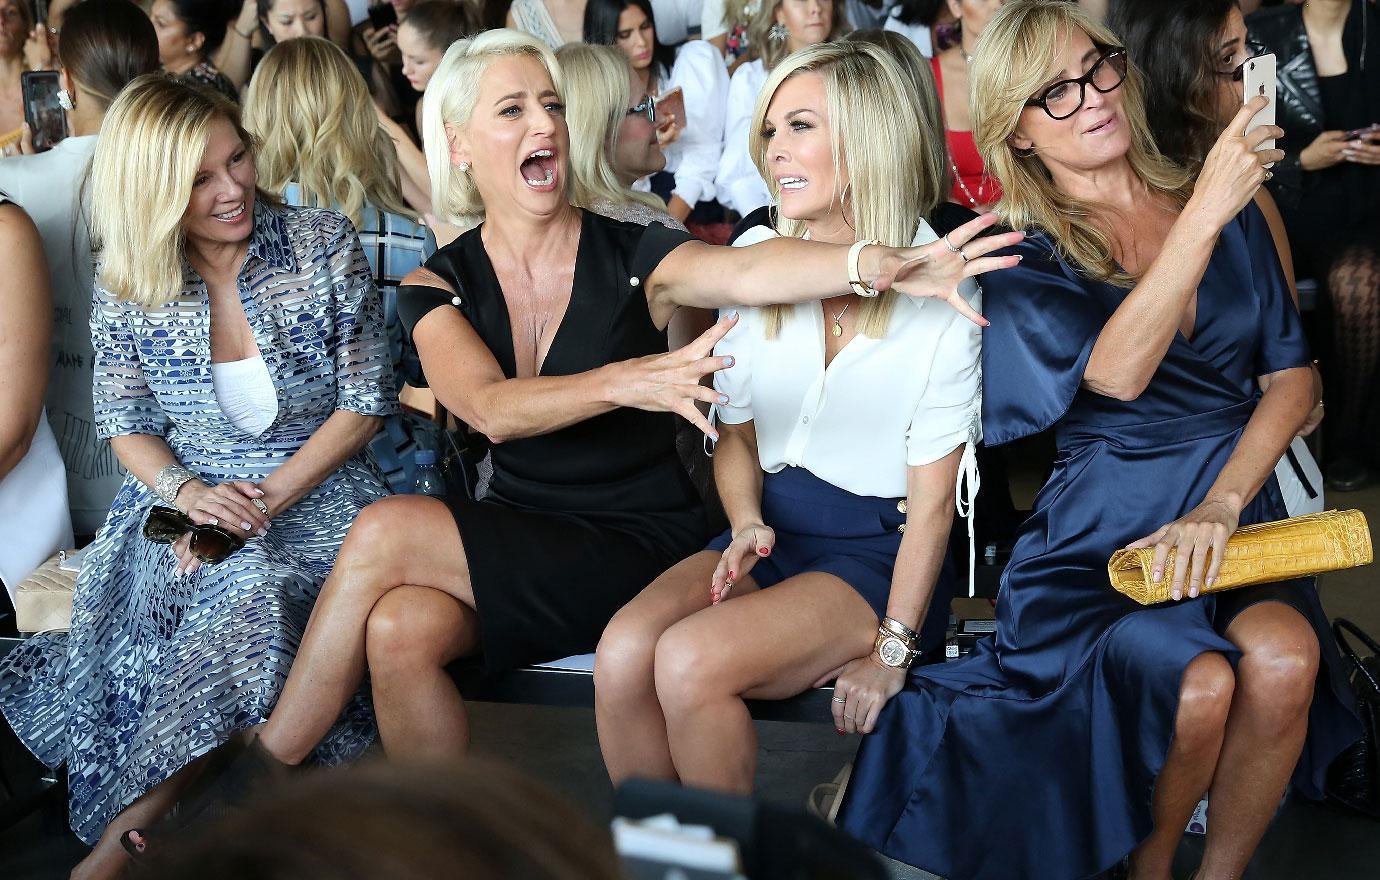 RHONY Stars Cause Ruckus At Fashion Show